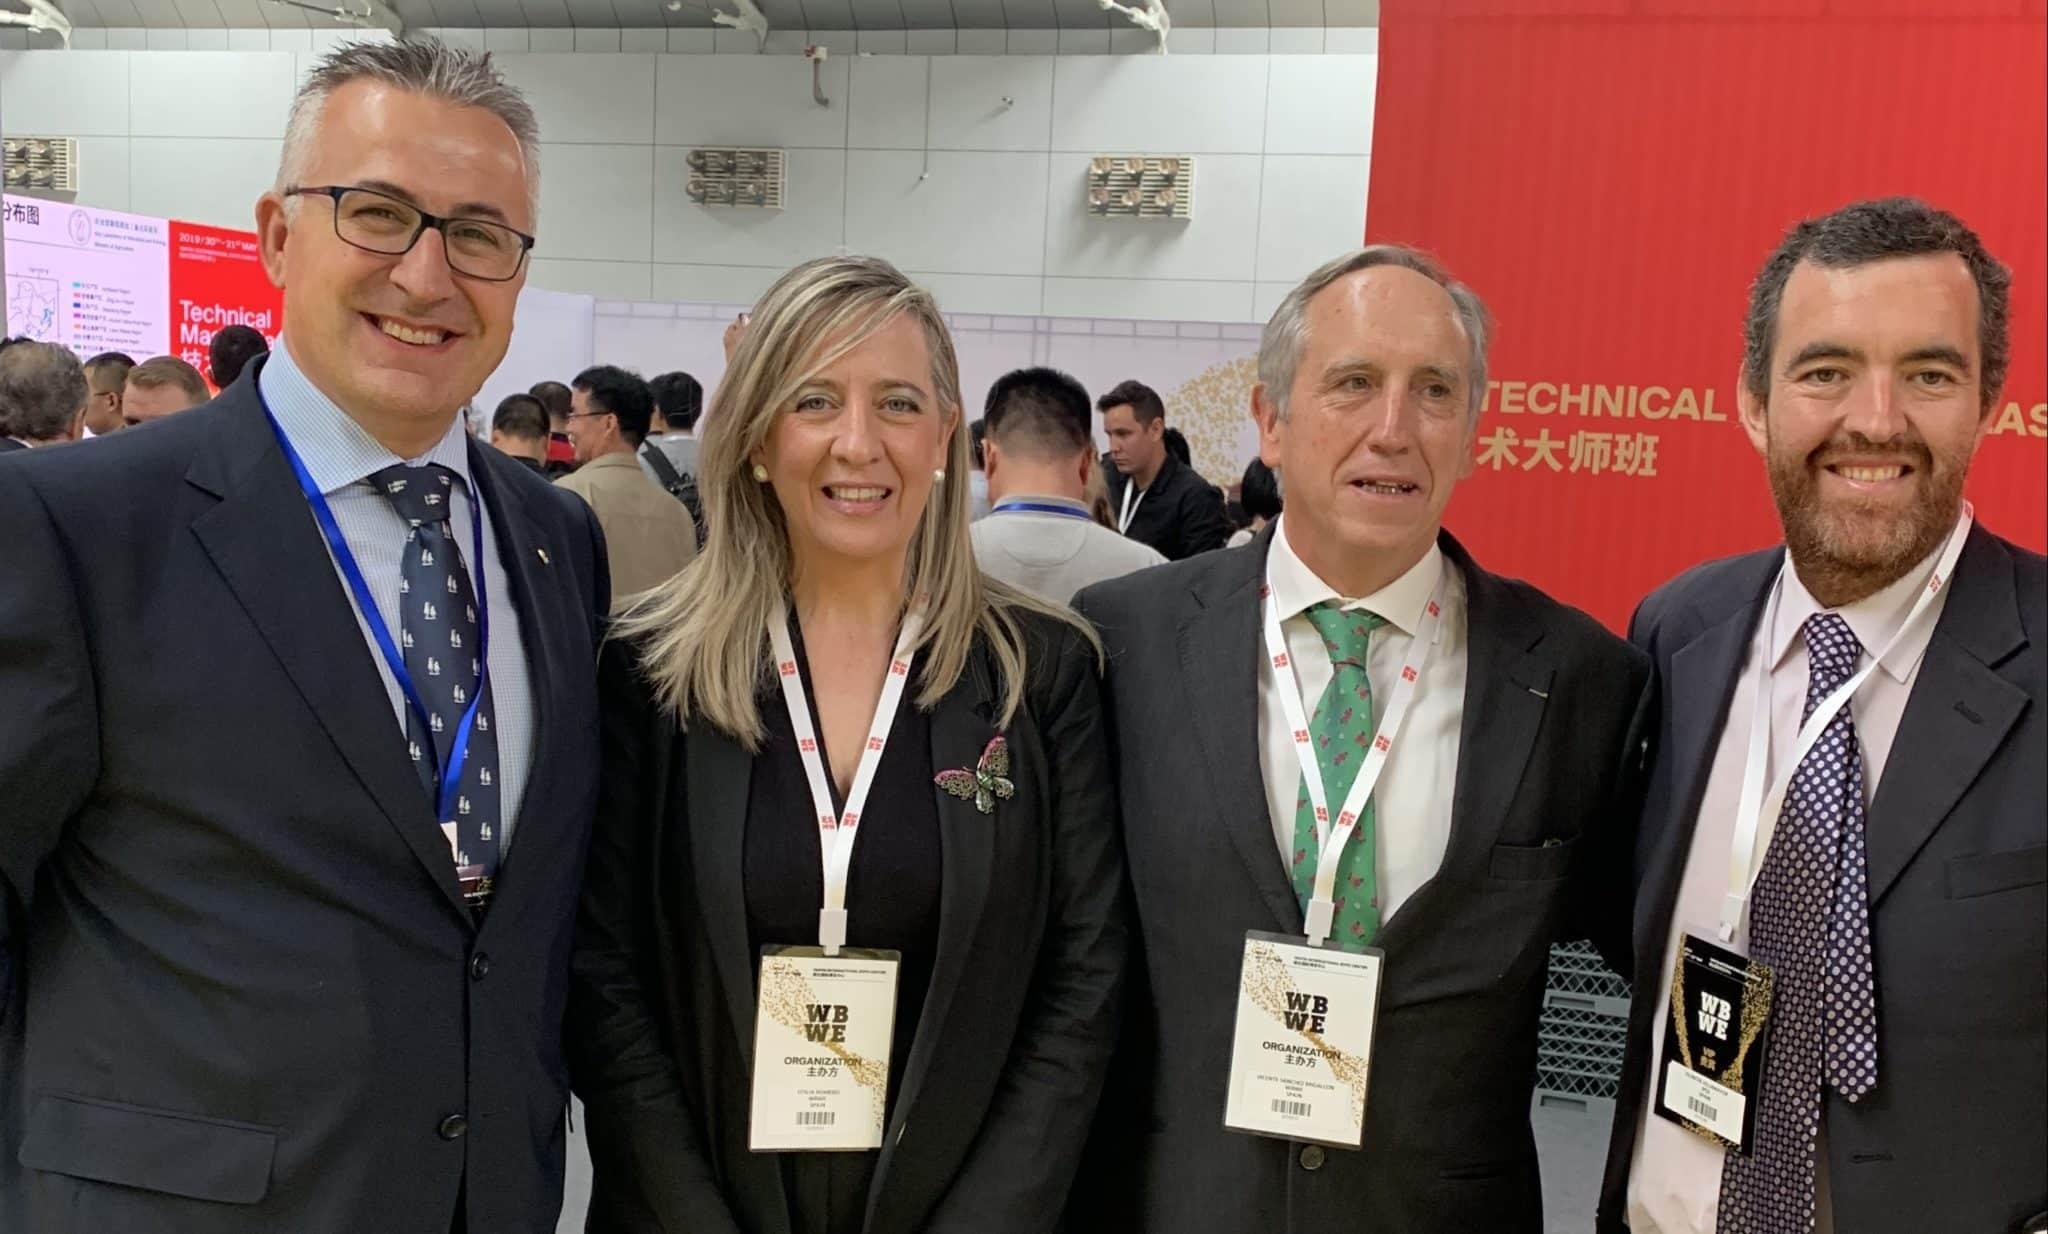 https://blog.globalcaja.es/wp-content/uploads/2019/05/globalcaja1-wbwe-china-mayo-2019.jpg